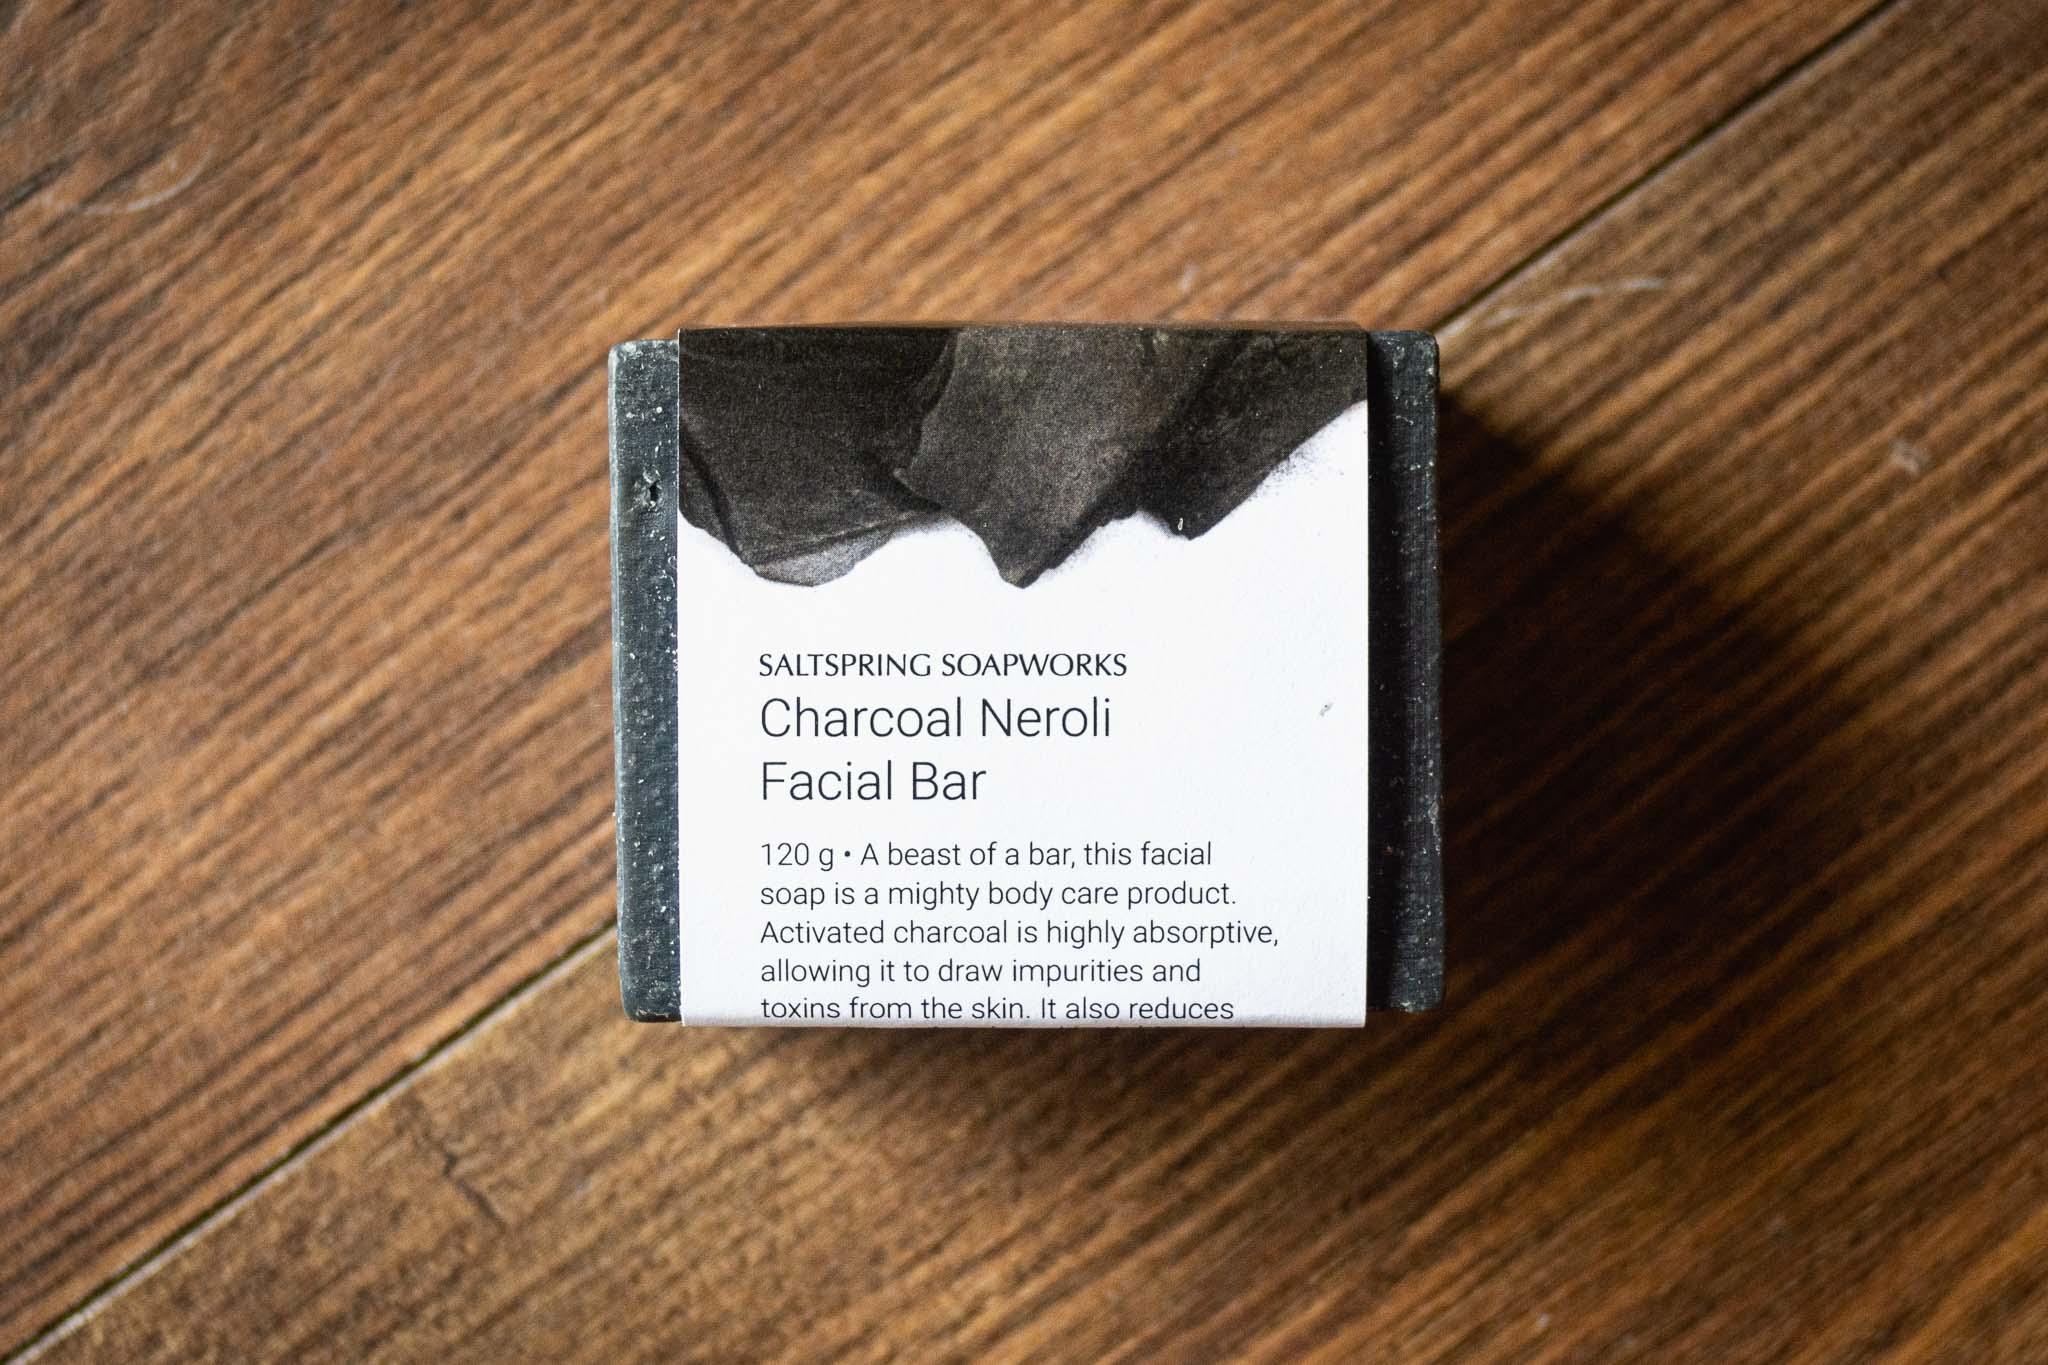 Charcoal Neroli Facial Bar by Saltspring Soapworks